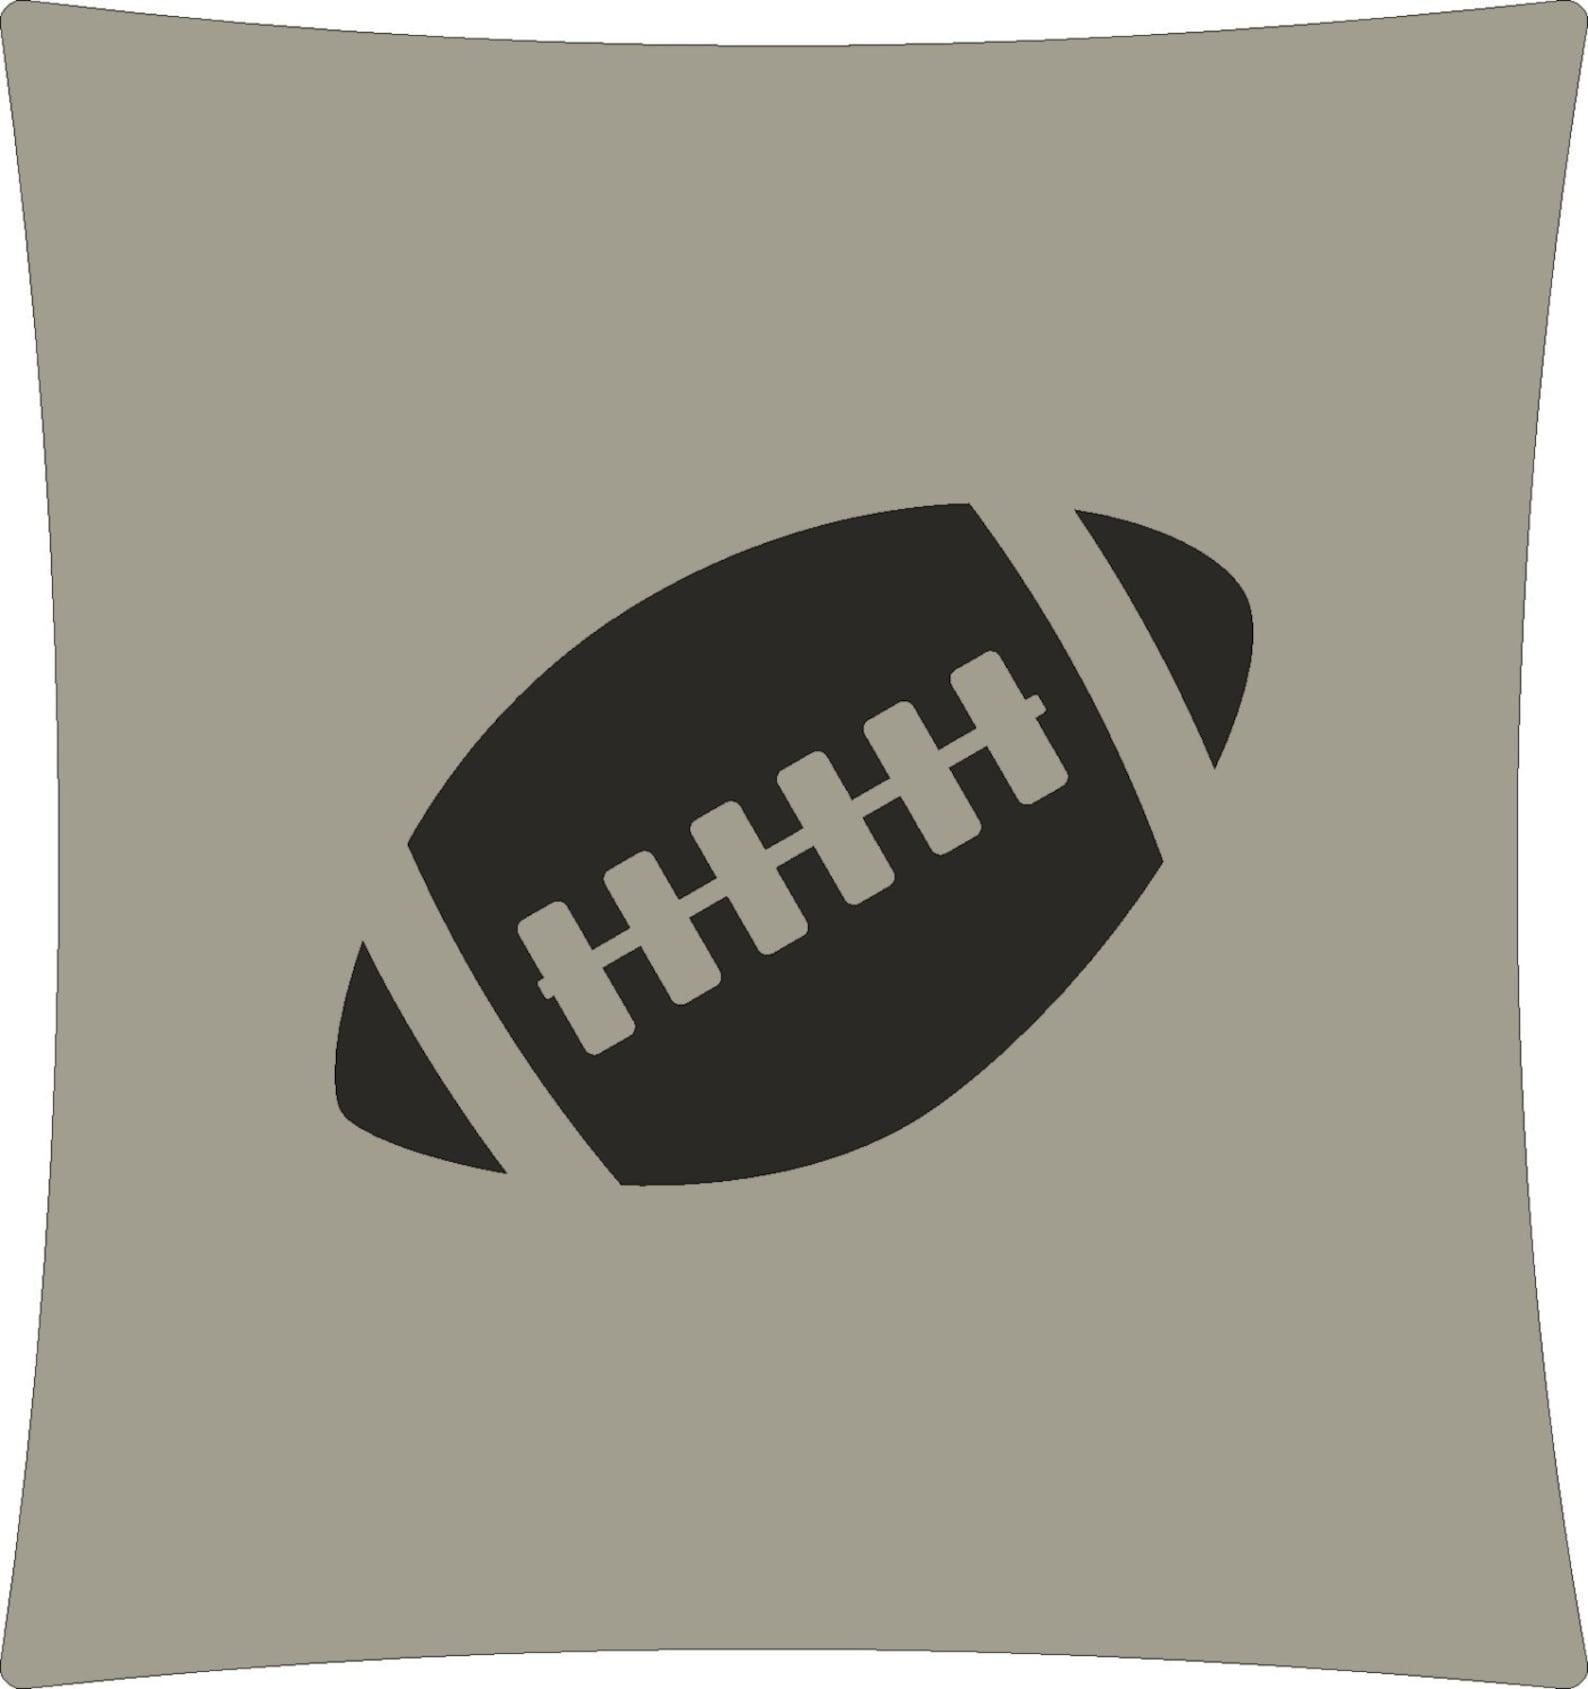 custom cushion cover with hand cut icon - hockey, boxing, soccer, football, skating, ballet and princess